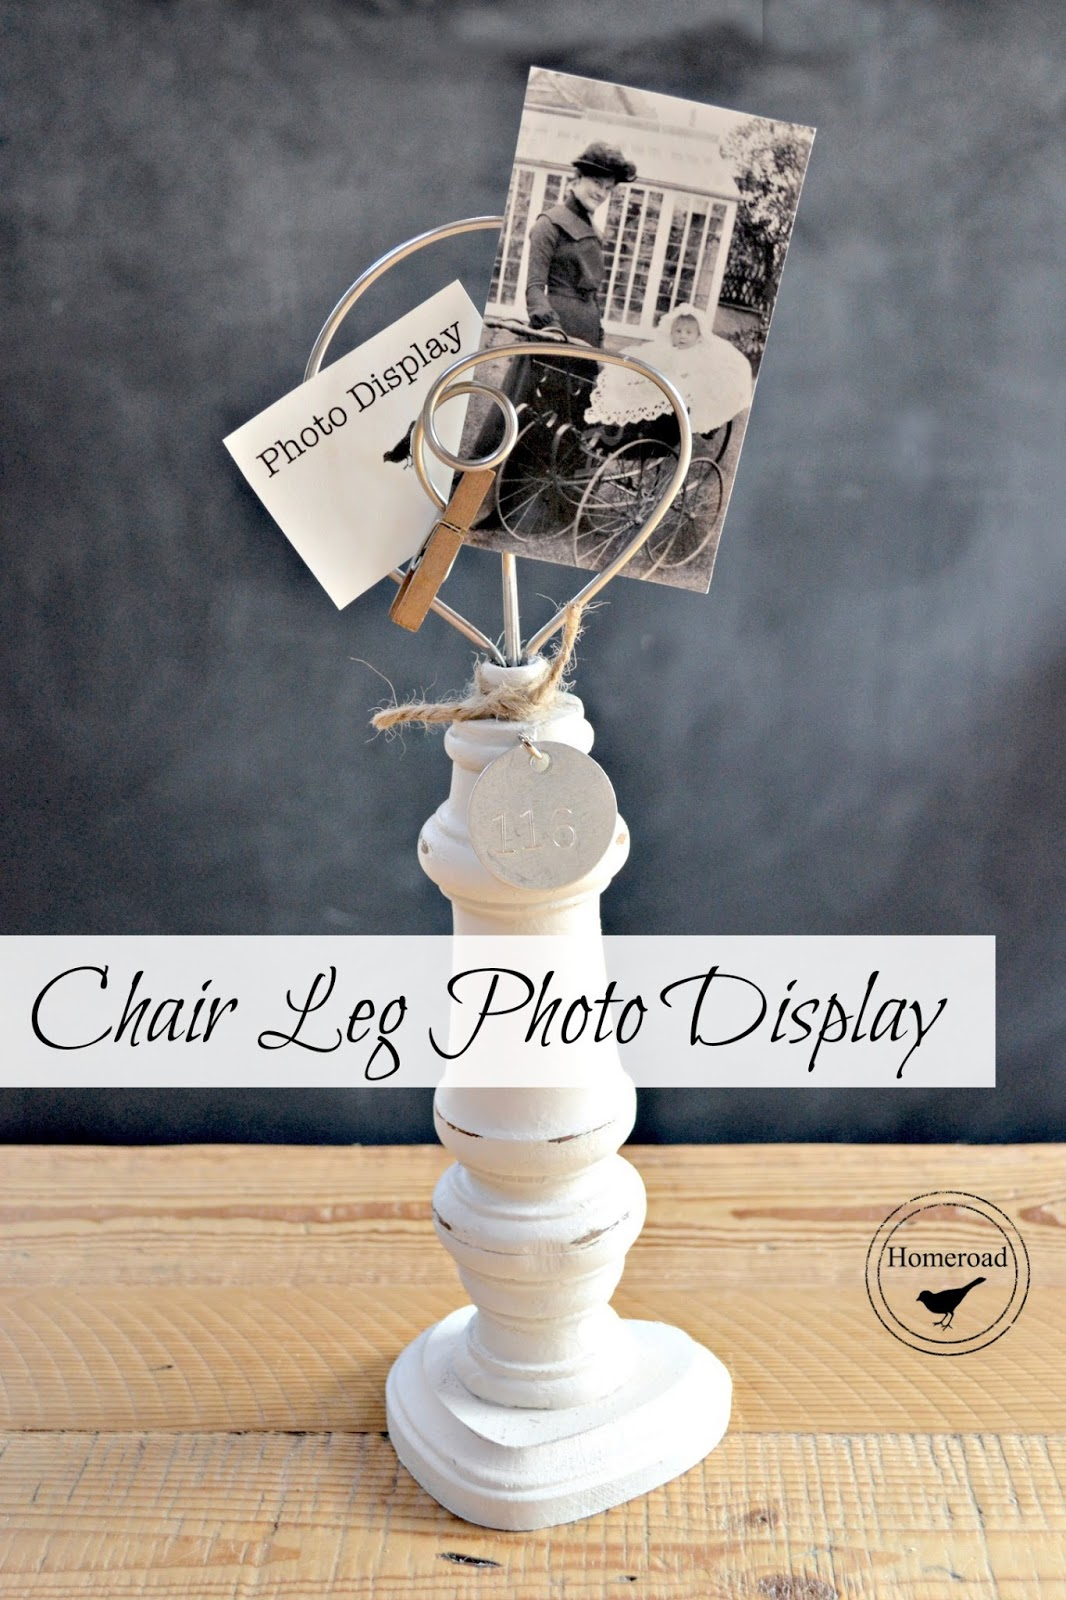 chair leg vintage photo display www.homeroad.net